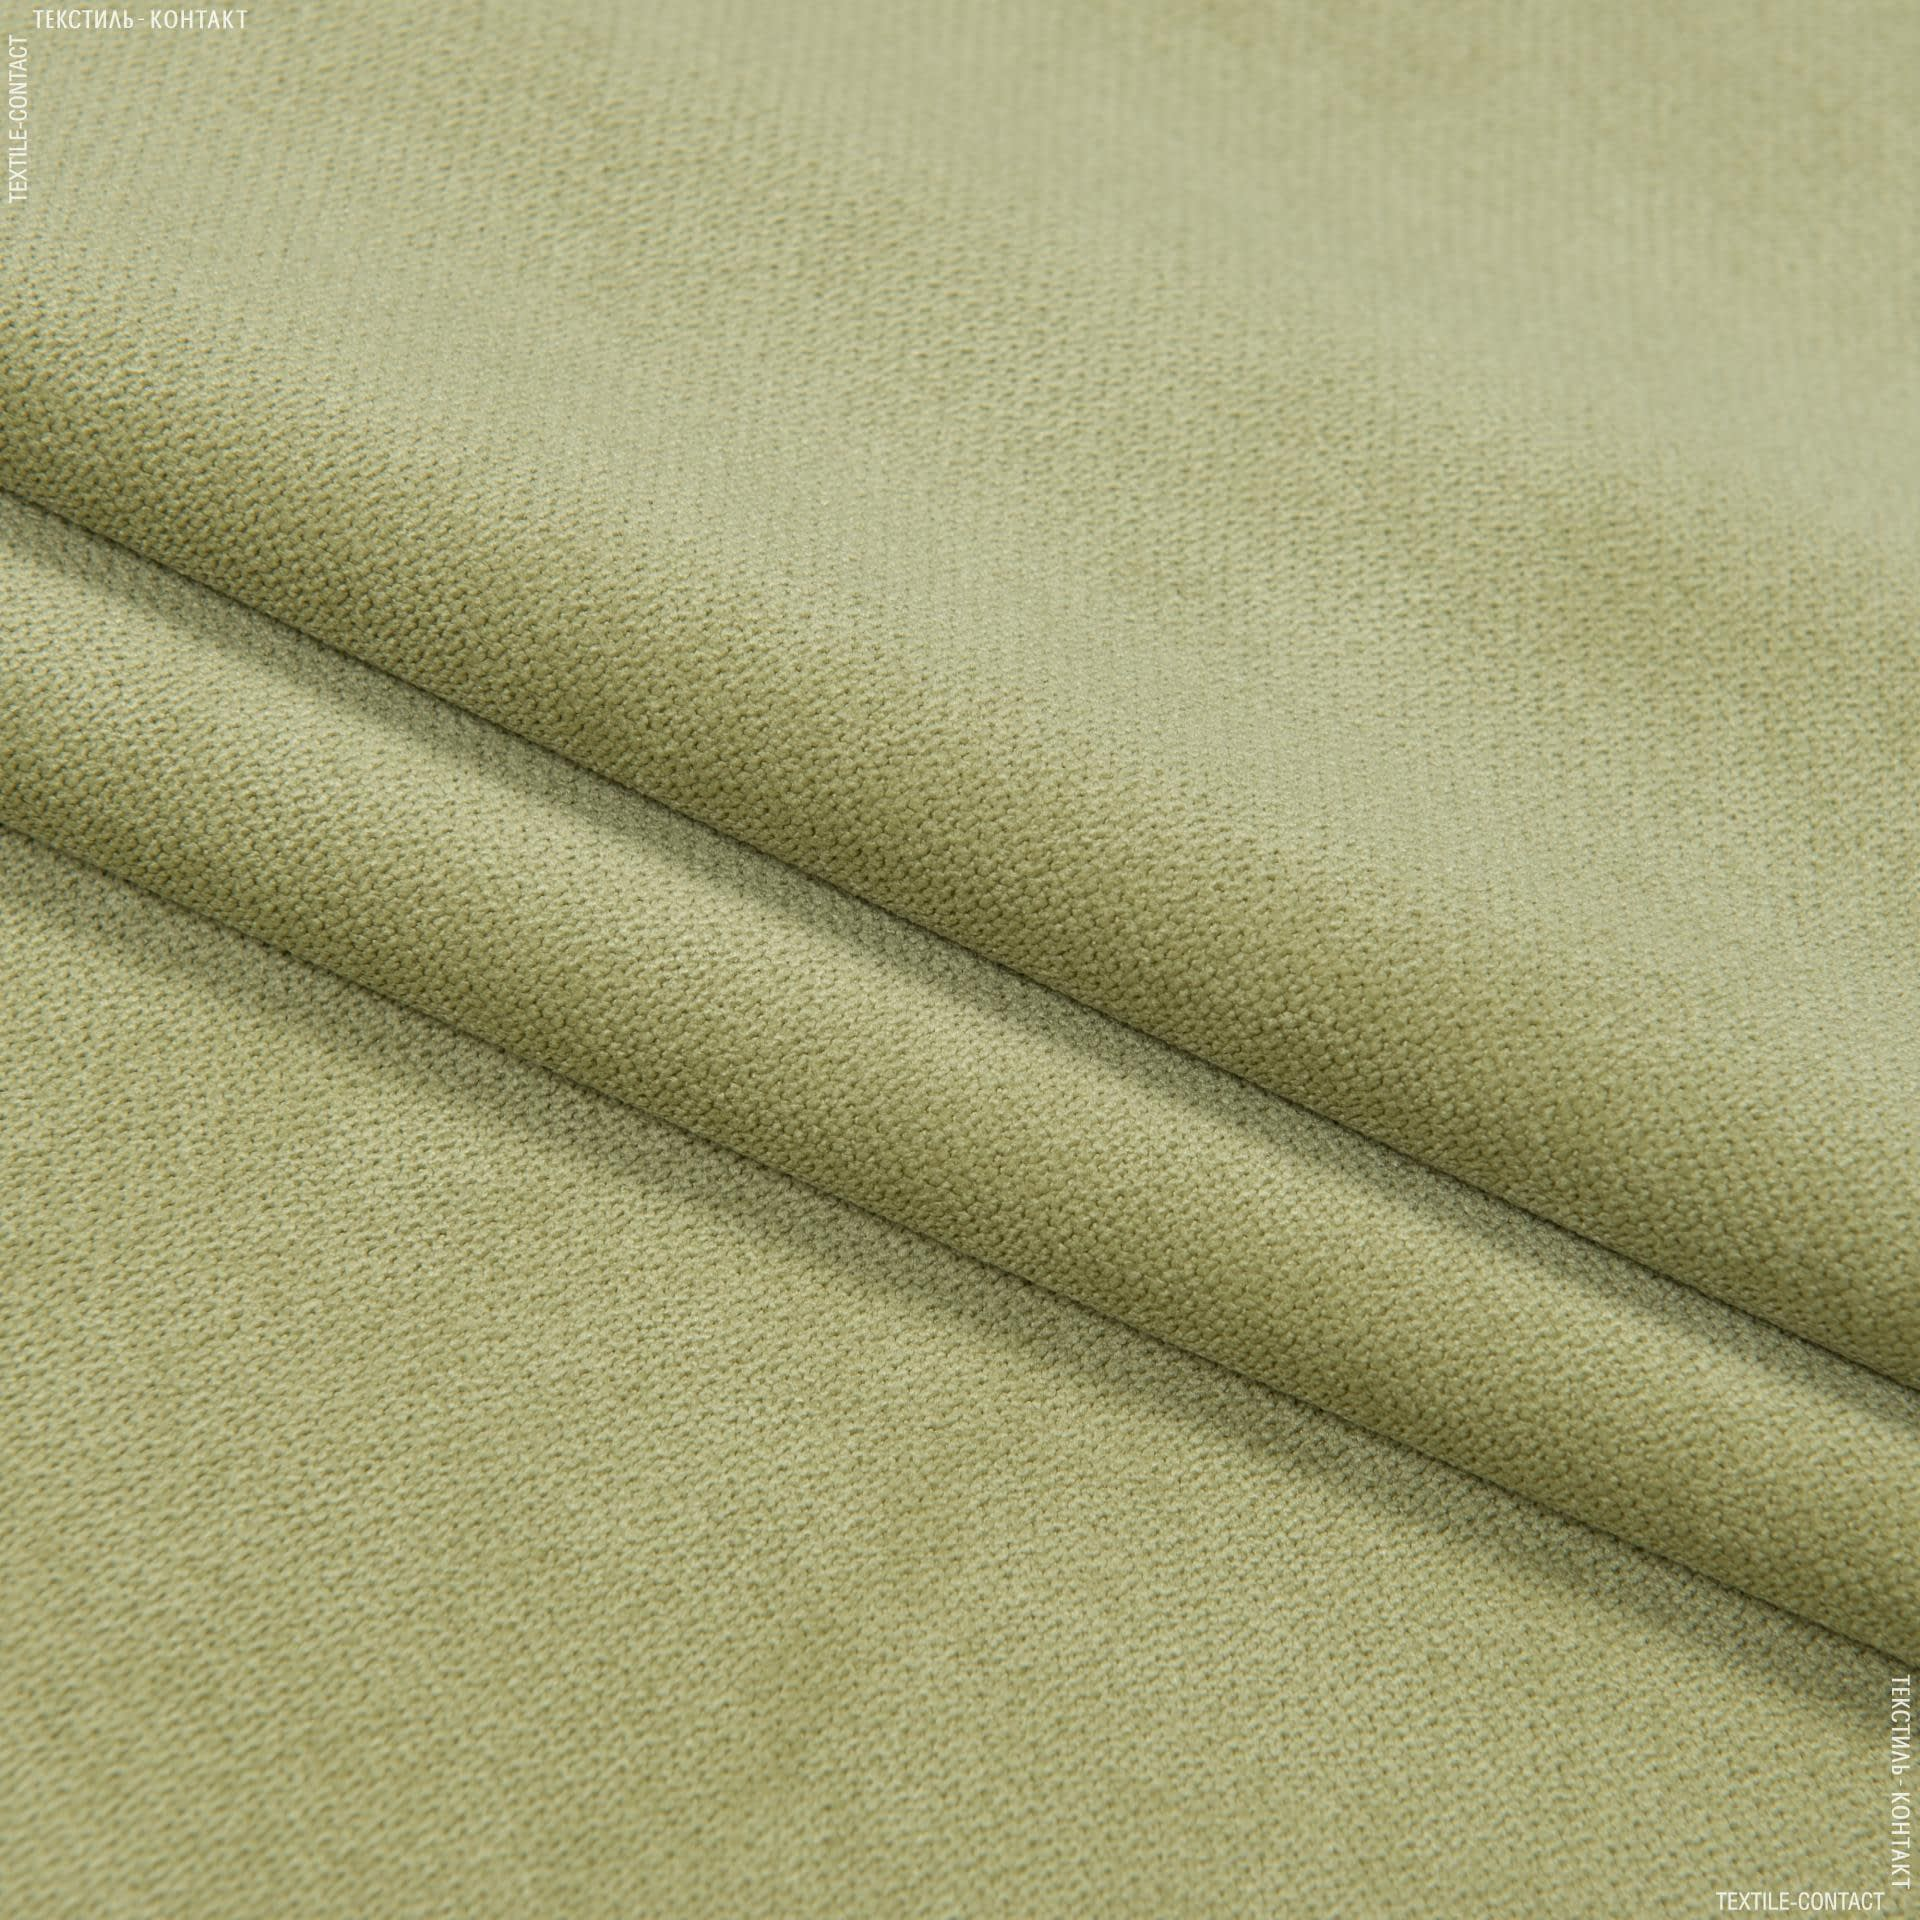 Ткани для мебели - Велюр будапешт/budapest  зеленая оливка